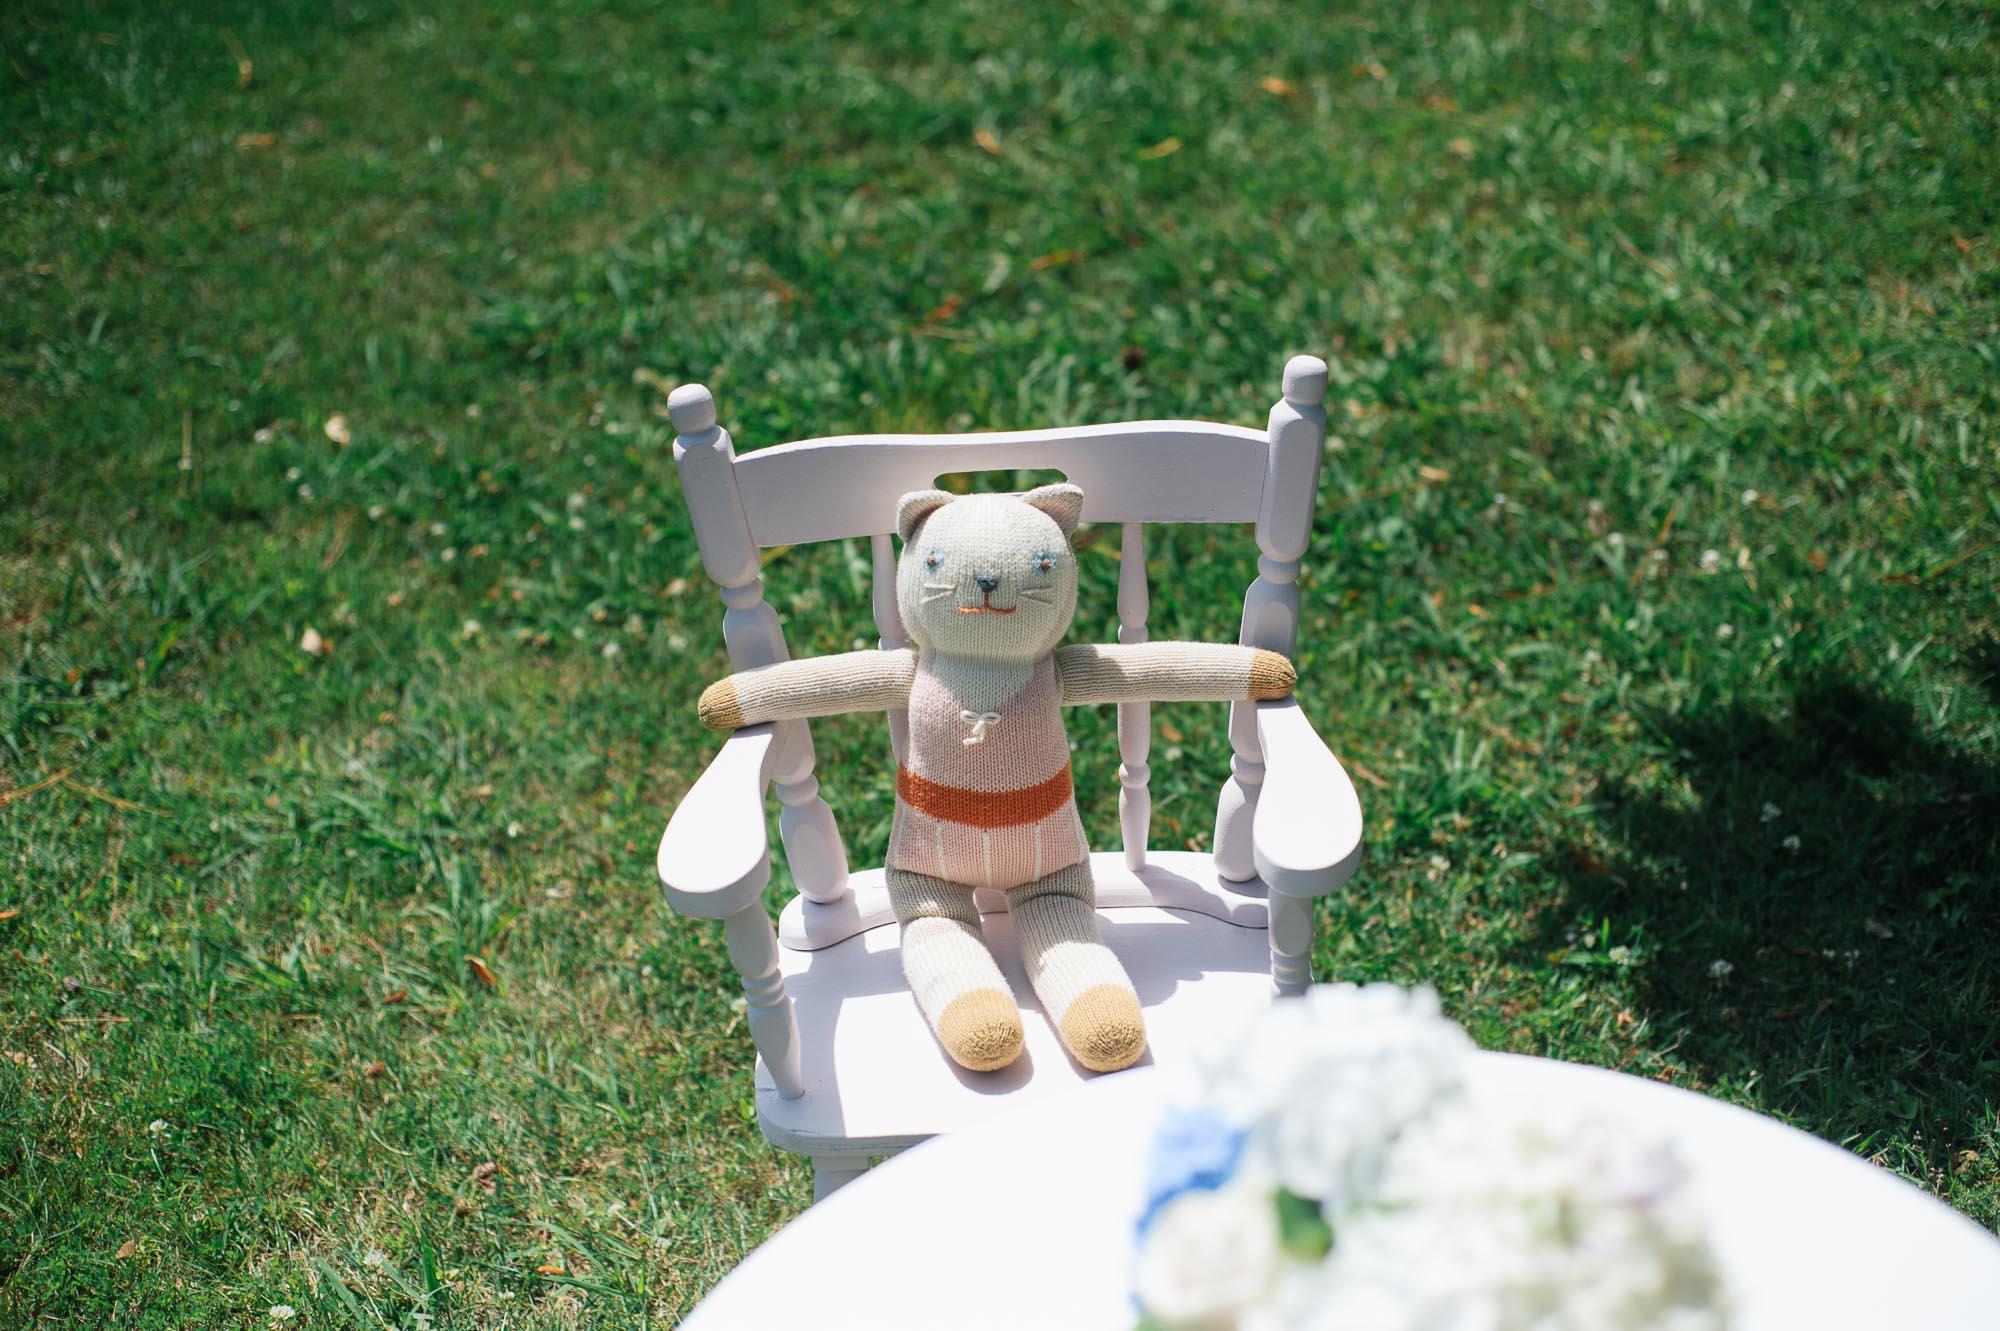 m.newsom-photography-one-year-old-girls-birthday-party-ideas-alice-in-wonderland (7 of 42).jpg